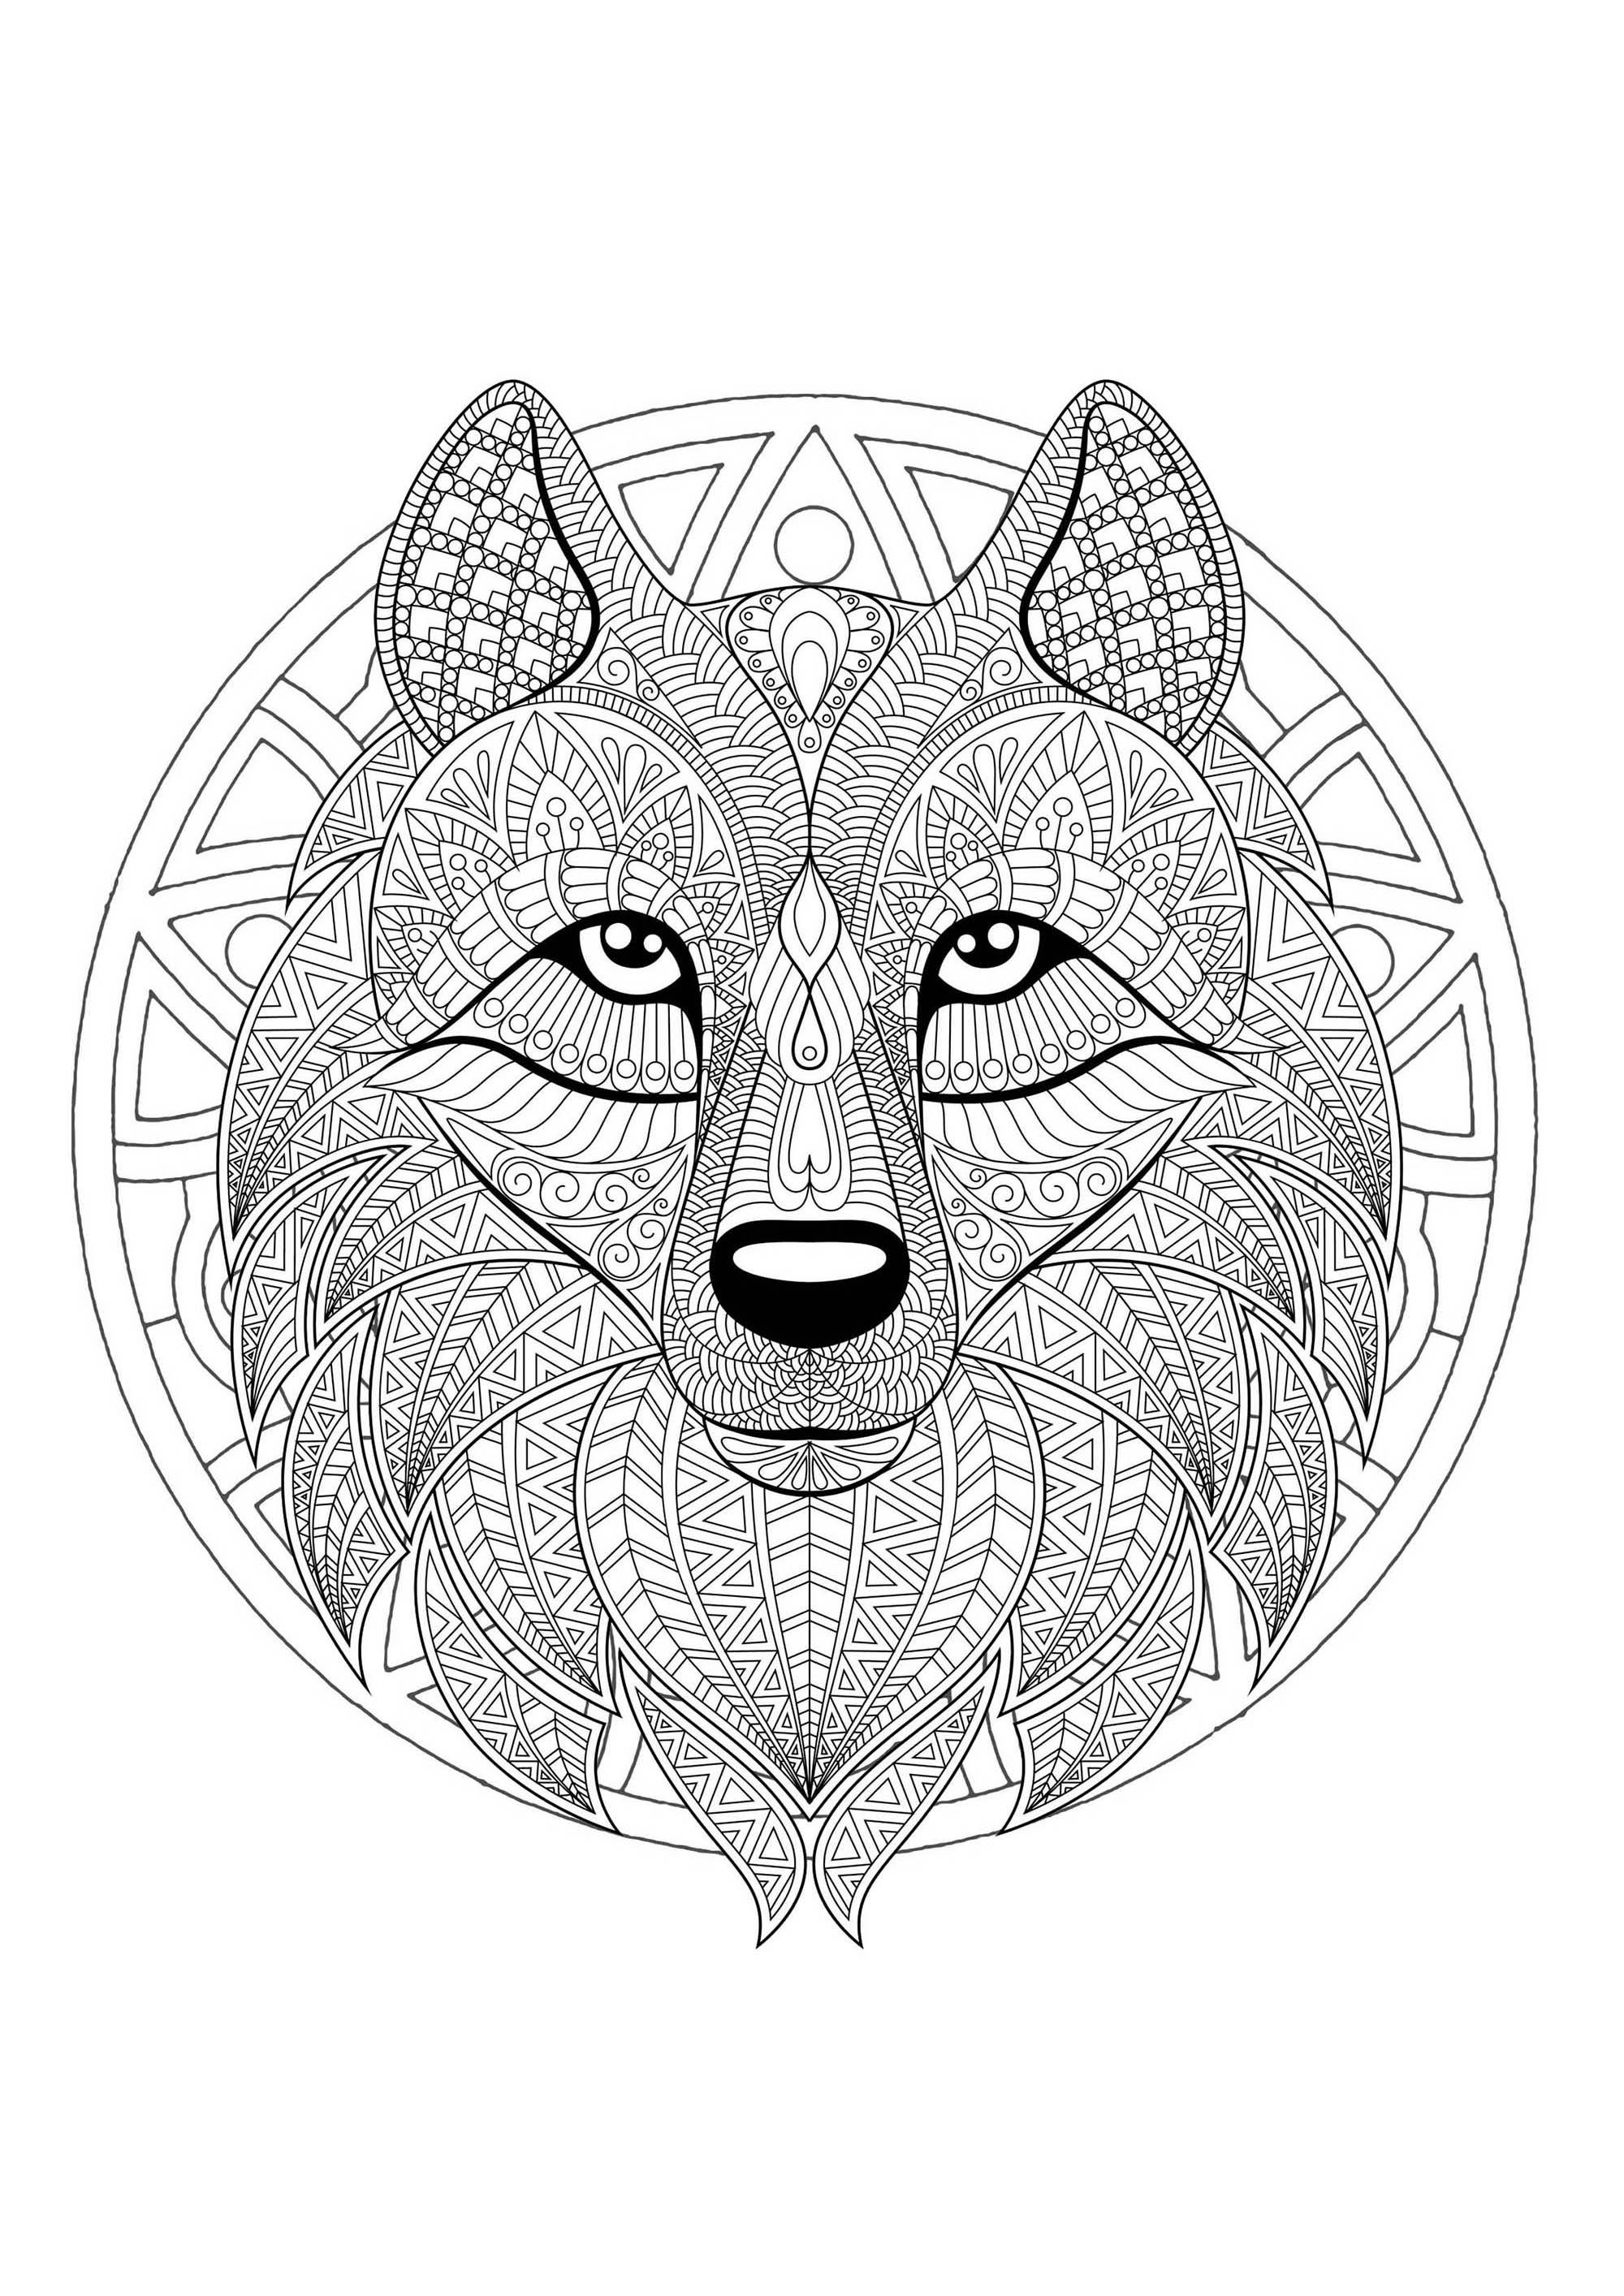 Mandalas 68267 - Mandalas - Malbuch Fur Erwachsene